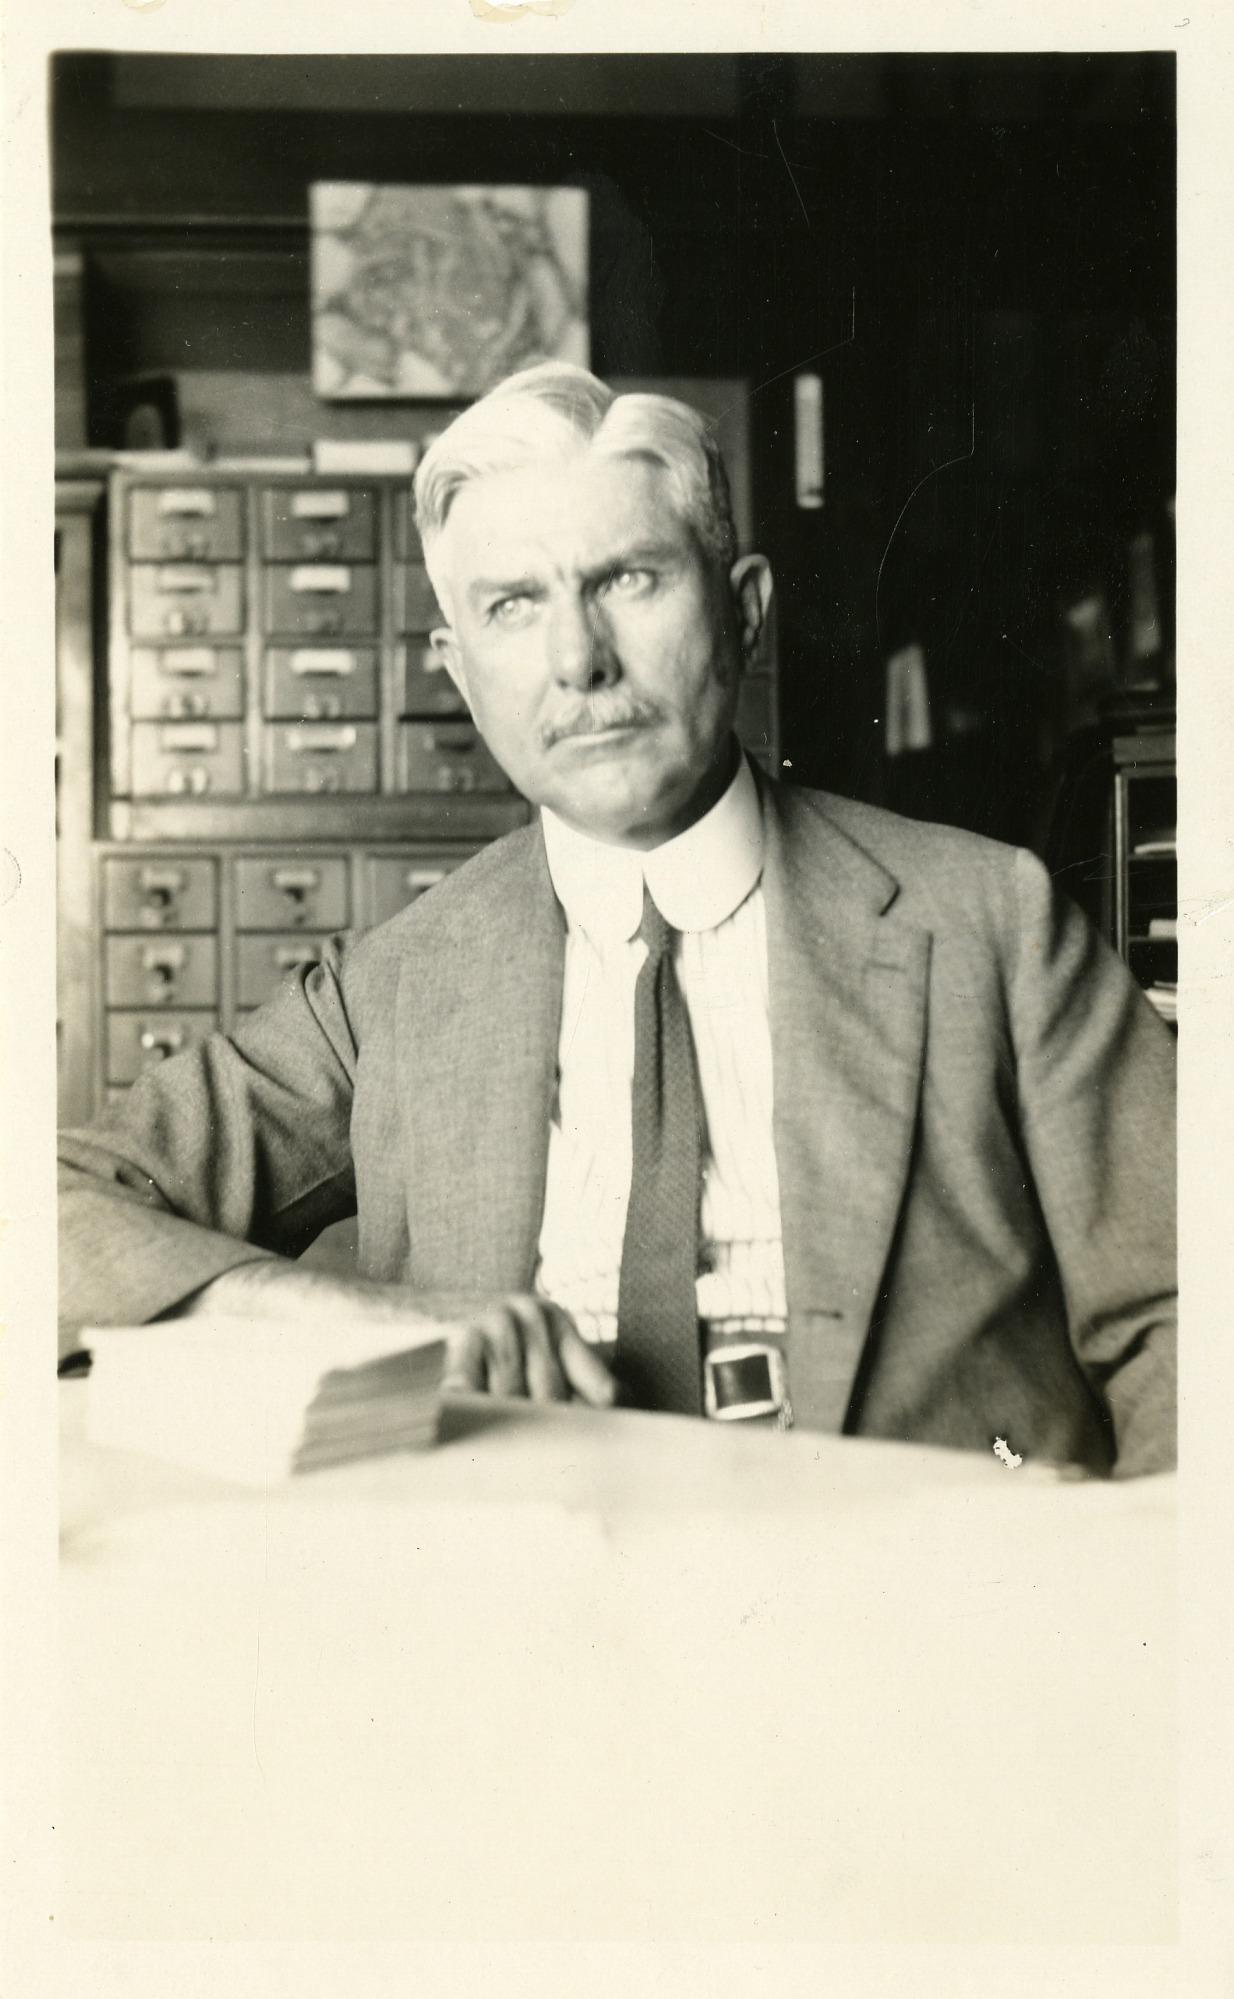 Eugene Willis Gudger (1866-1956), Smithsonian Institution Archives, SIA Acc. 90-105 [SIA2008-2158].